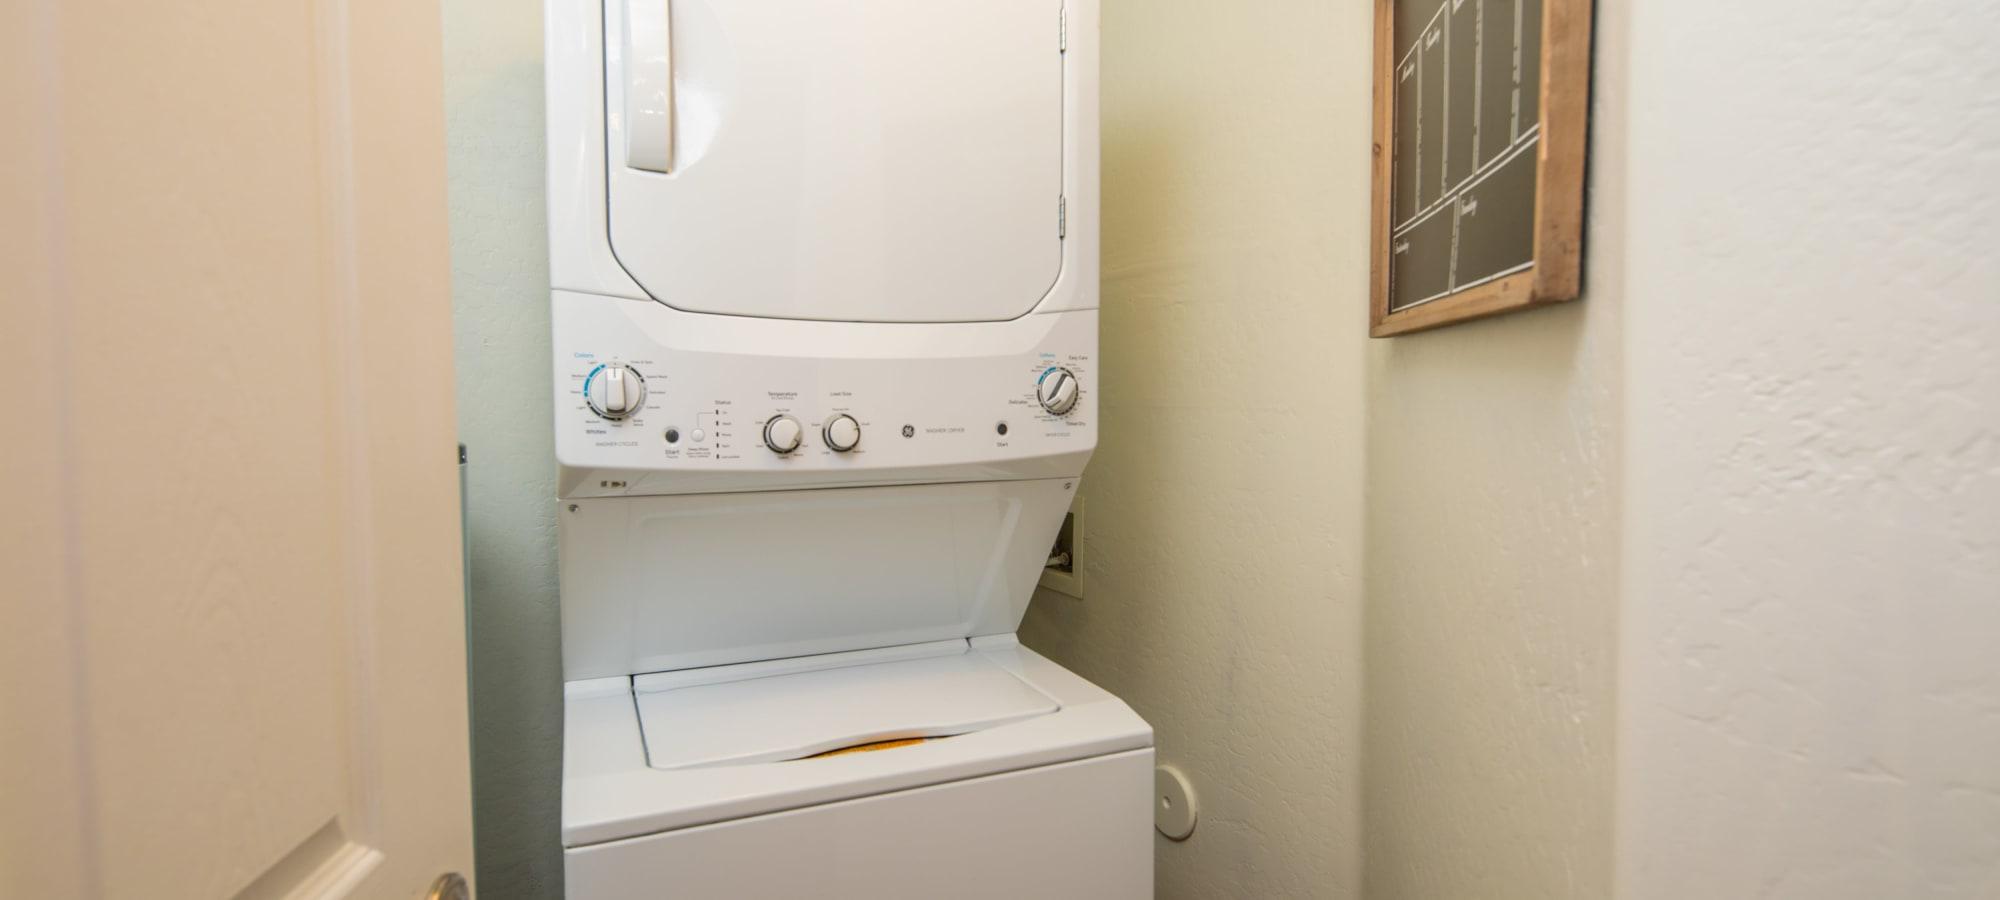 Washing machine at The Fleetwood in Tempe, Arizona